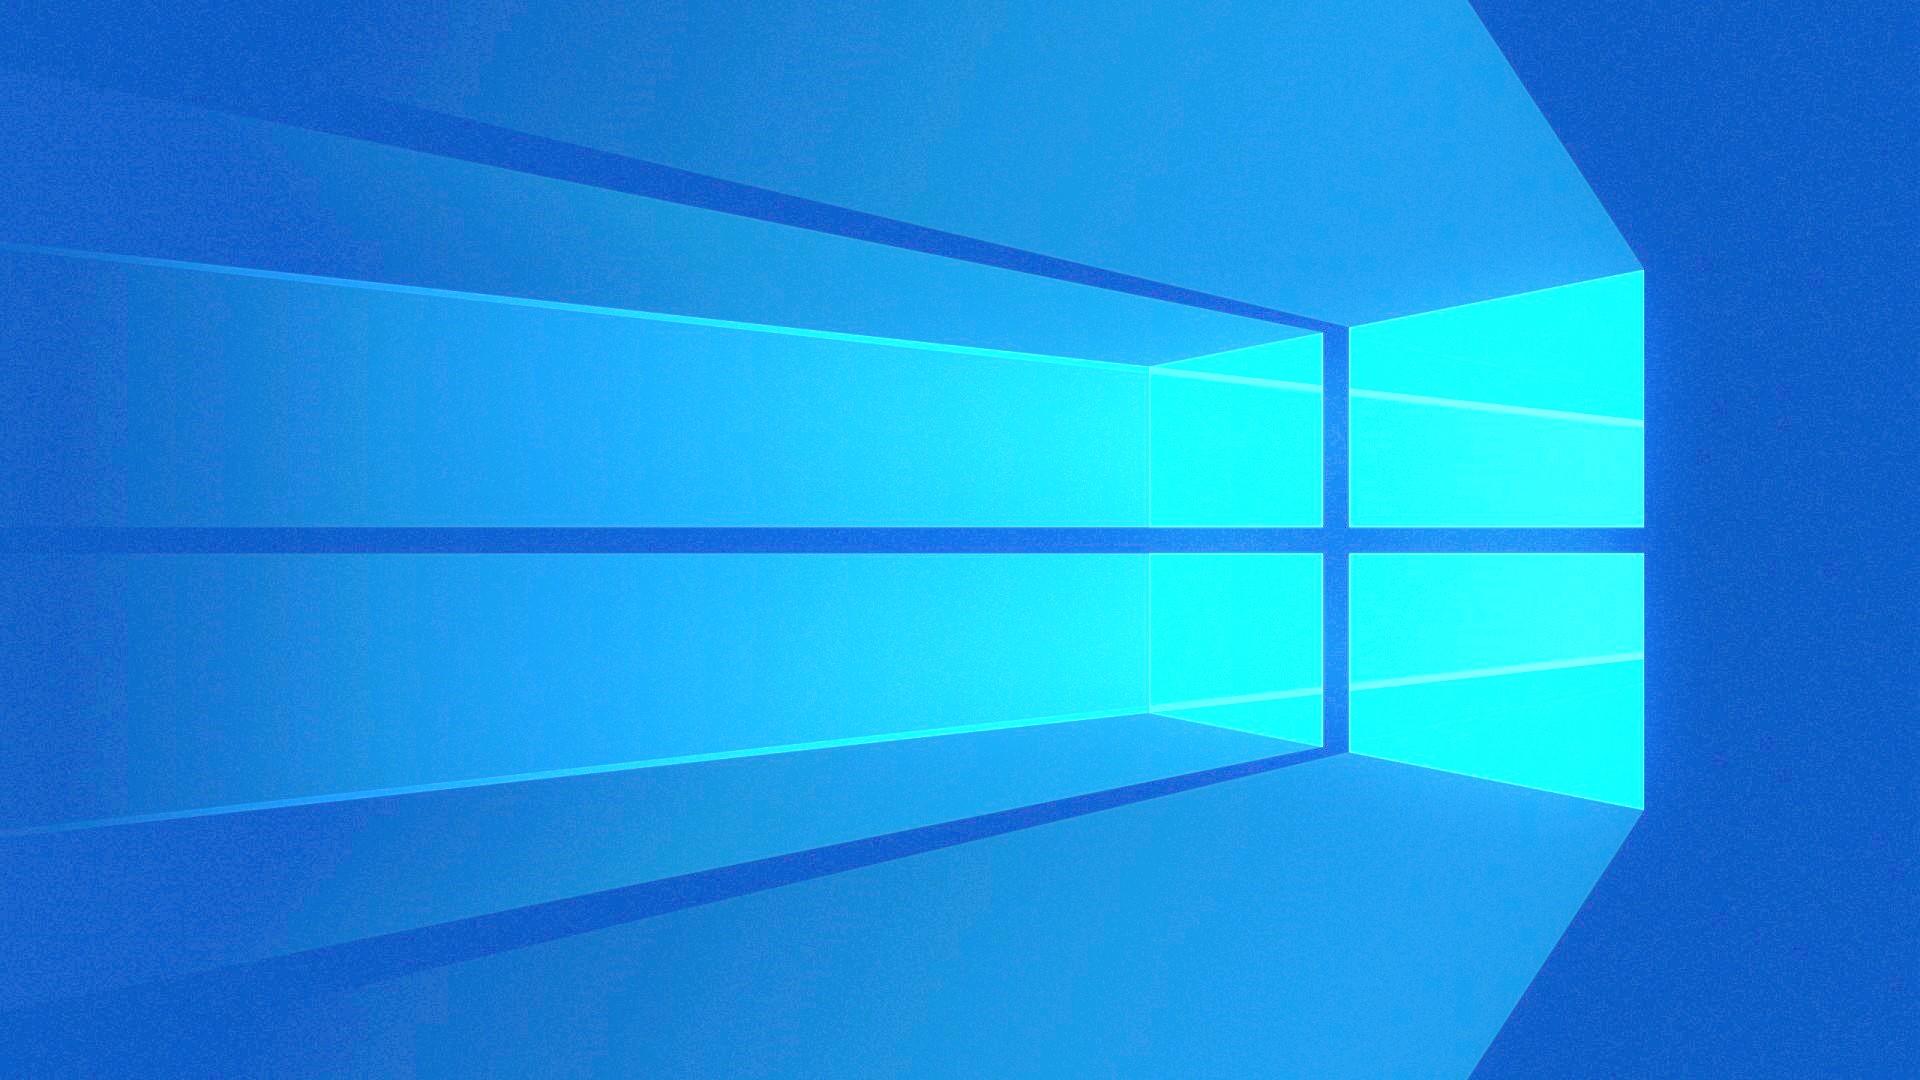 Windows 10 Wallpaper Blue Wallpapersafari